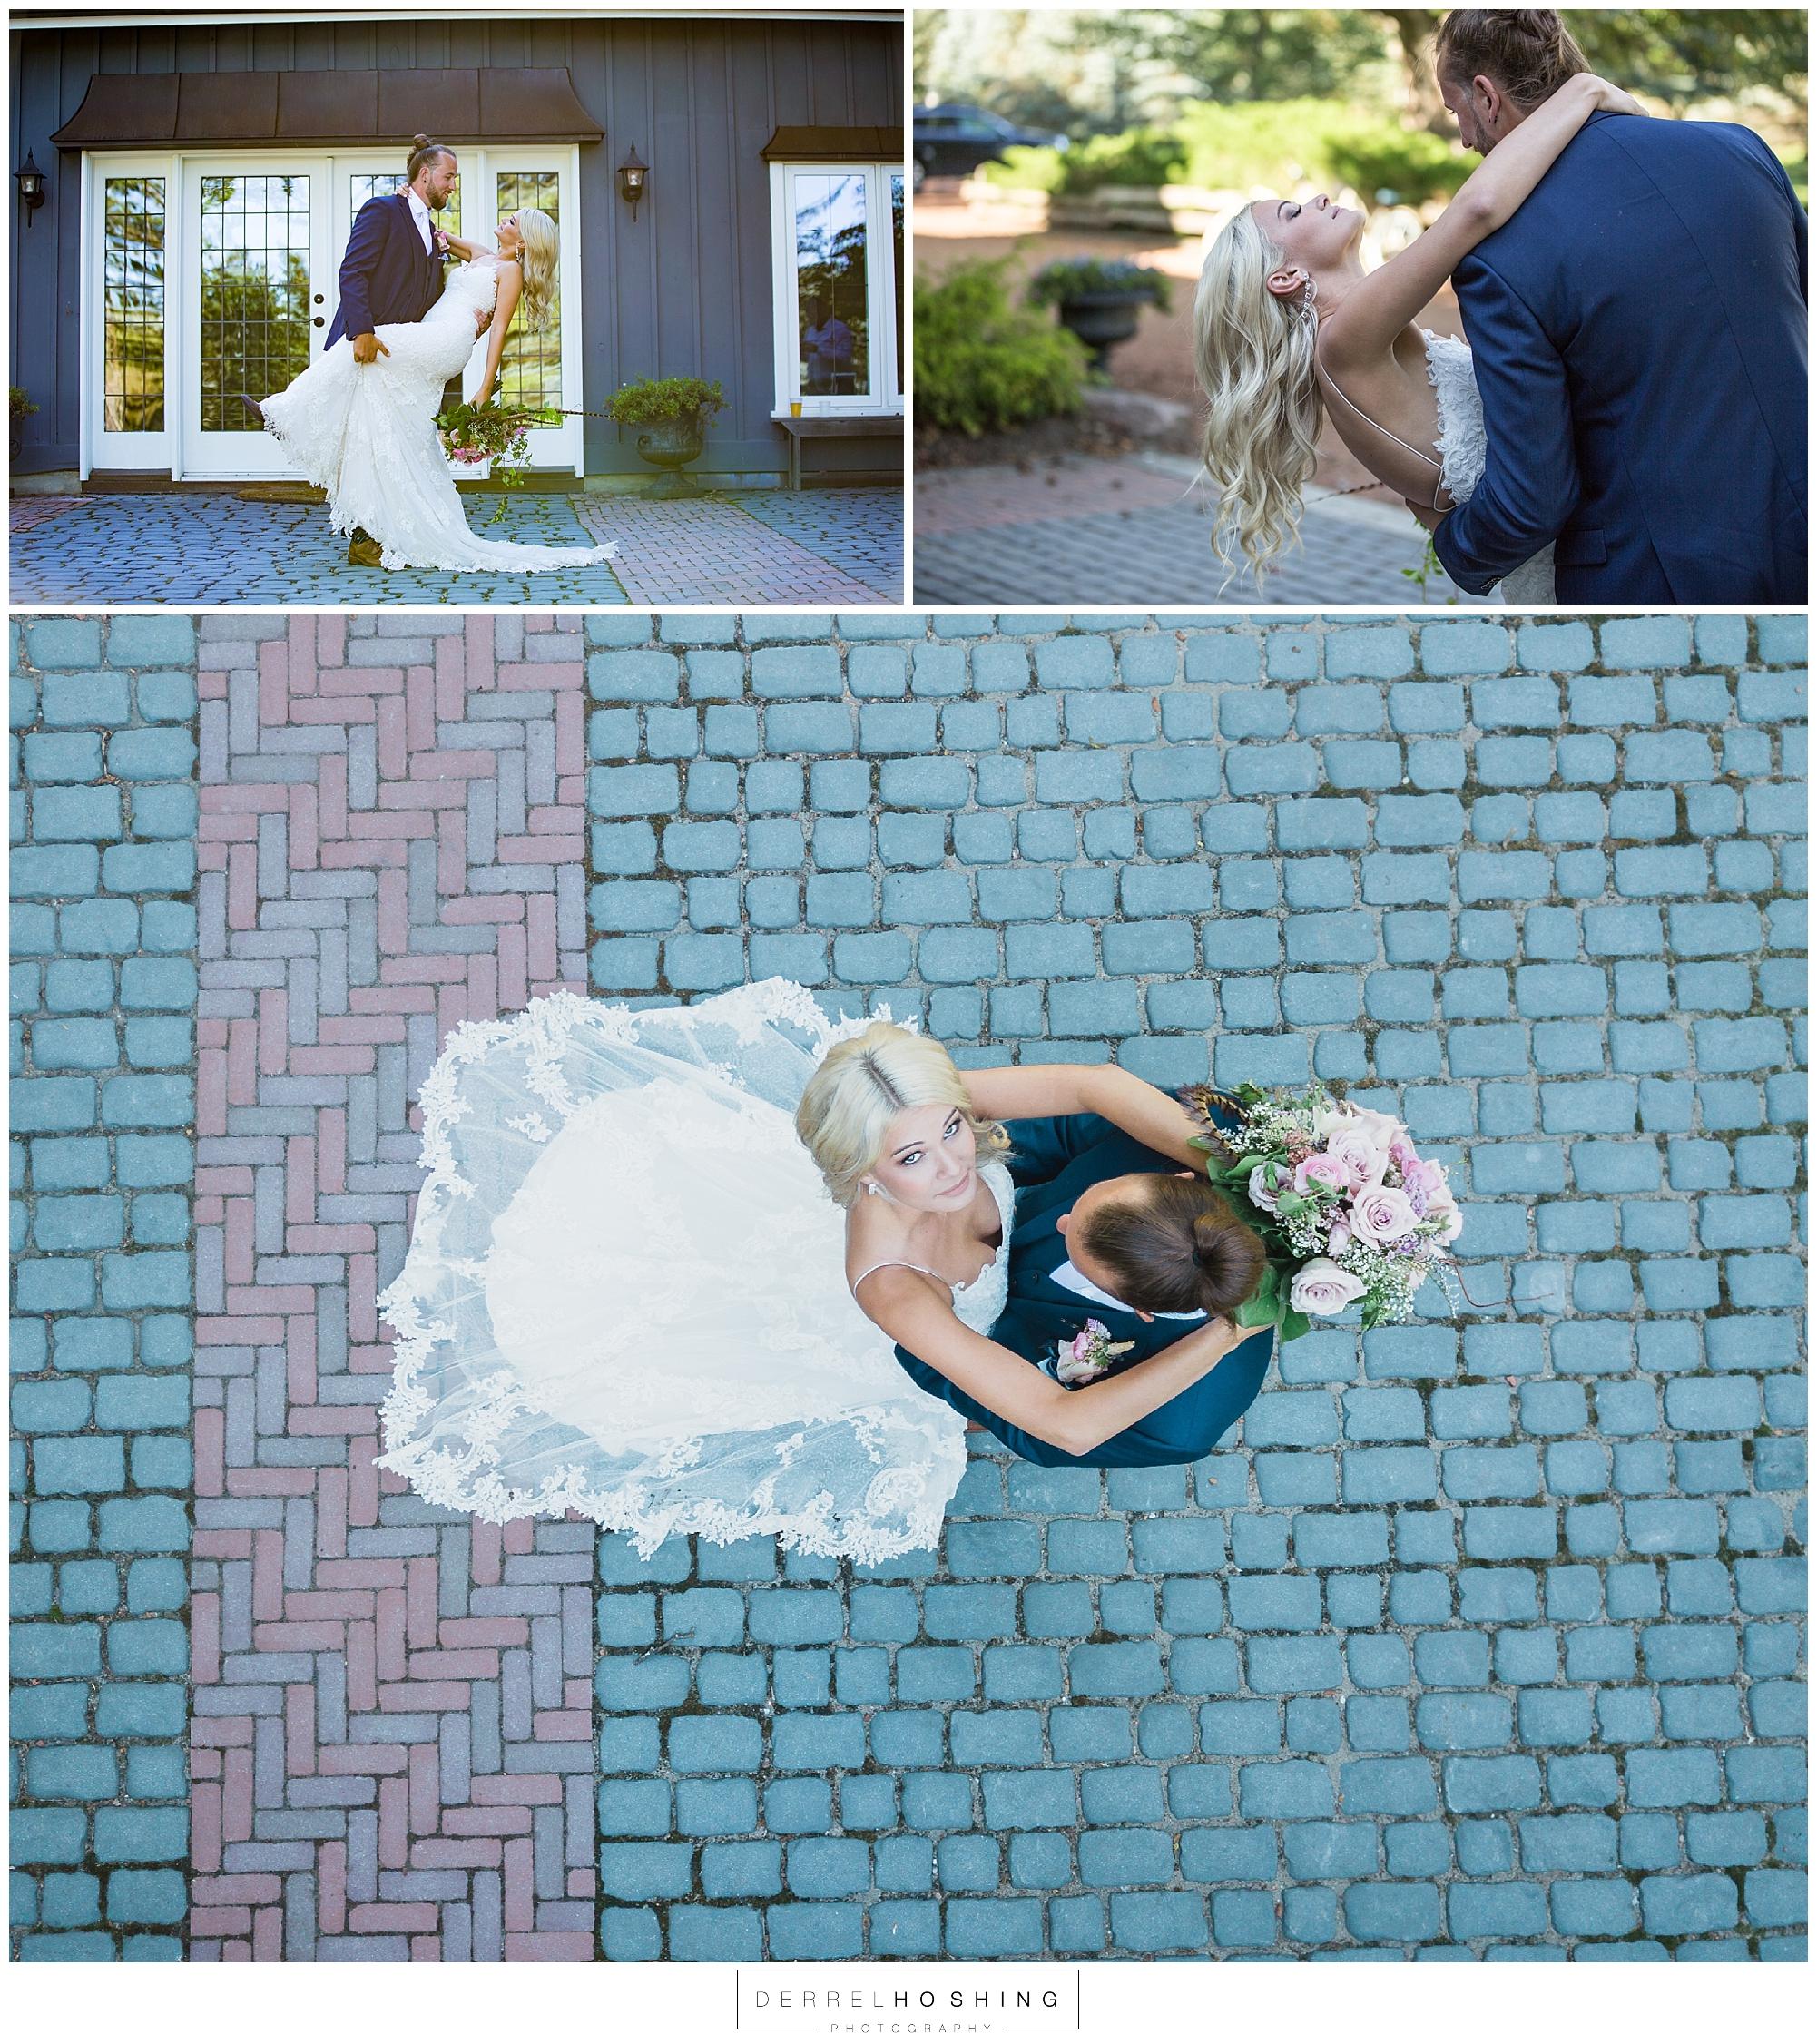 Belcroft-Estates-&-Event-Centre-Wedding-Innisfil-Ontario-0020.jpg